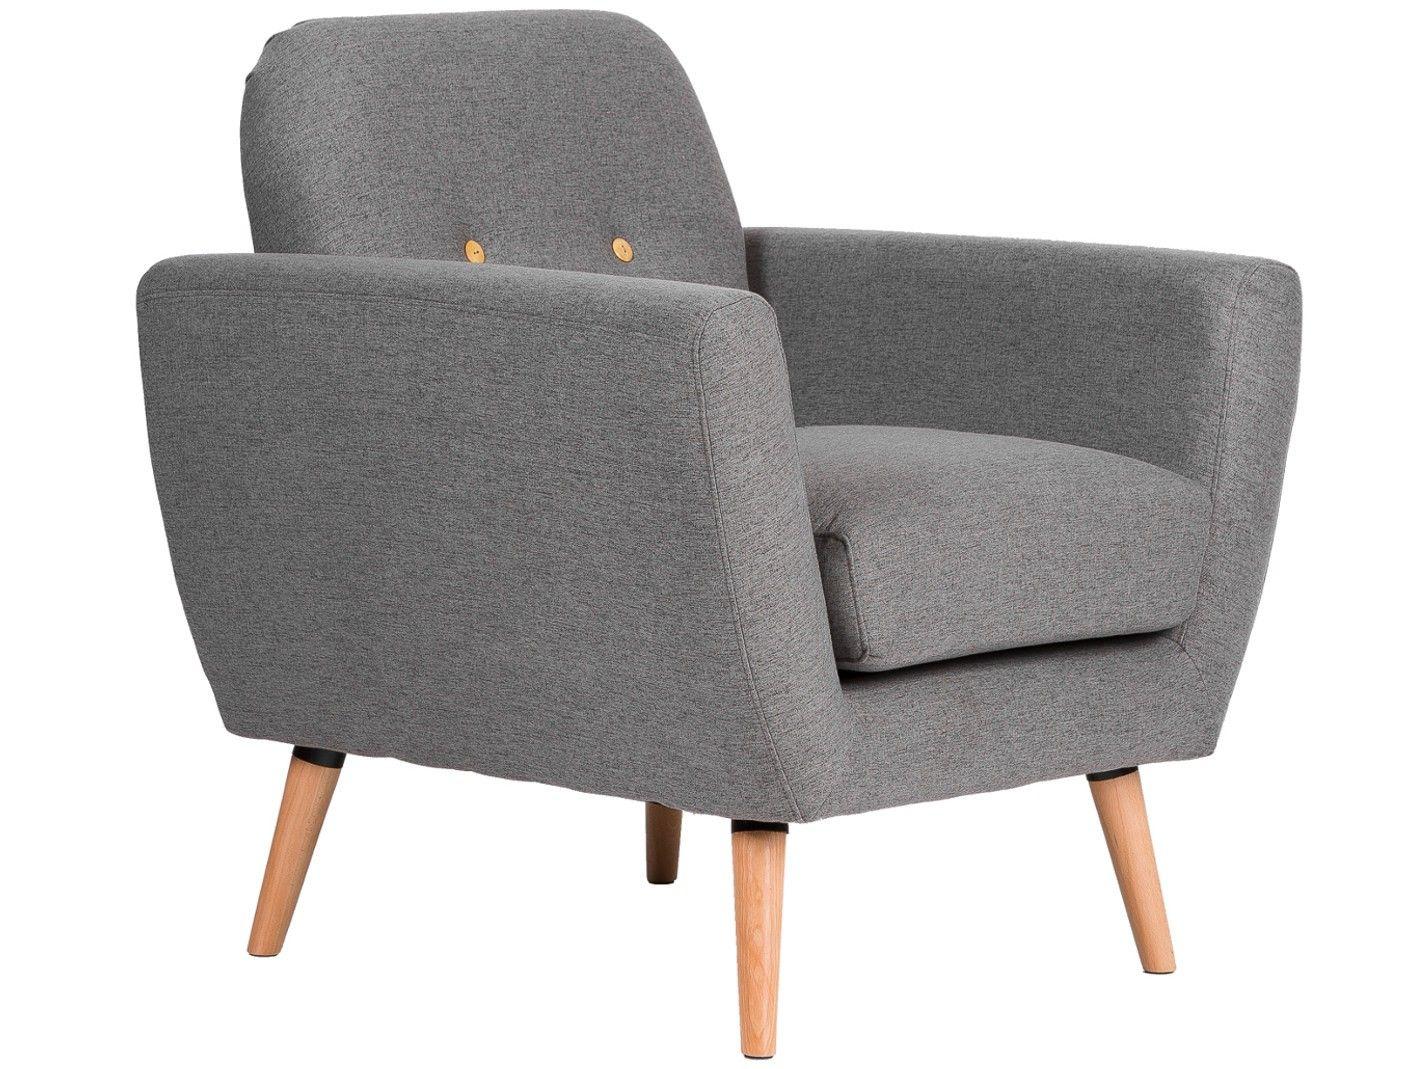 Sofás cama sofás convertibles Merkamueble Web OFICIAL